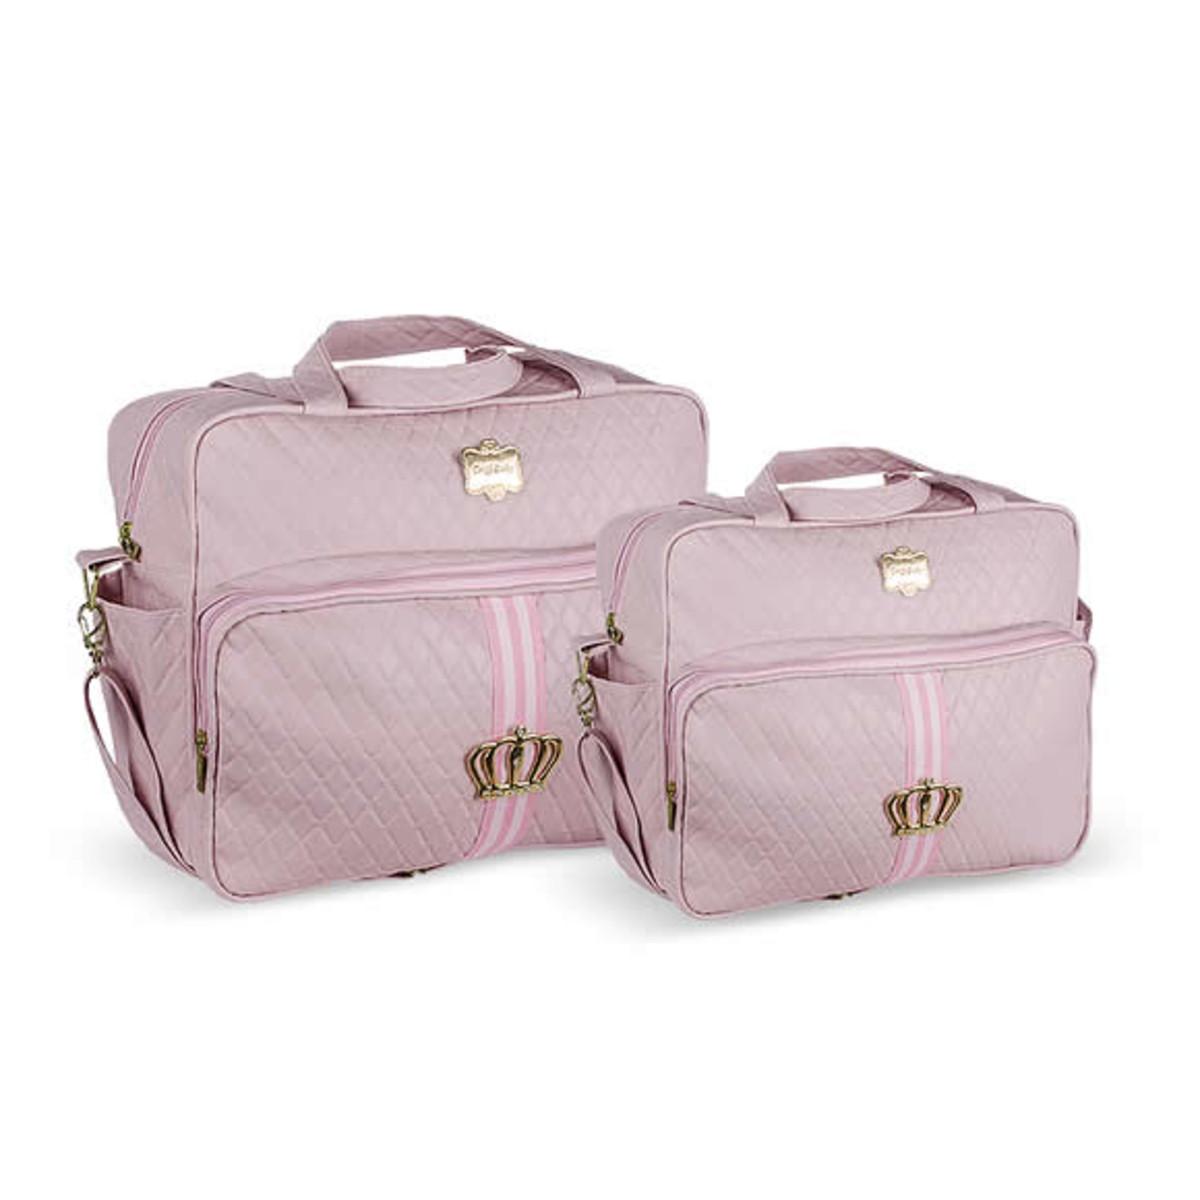 3dbb2c60d Kit Bolsa Maternidade Luxo Bebe Menina Rosa 3009-10 no Elo7 | Amor ...